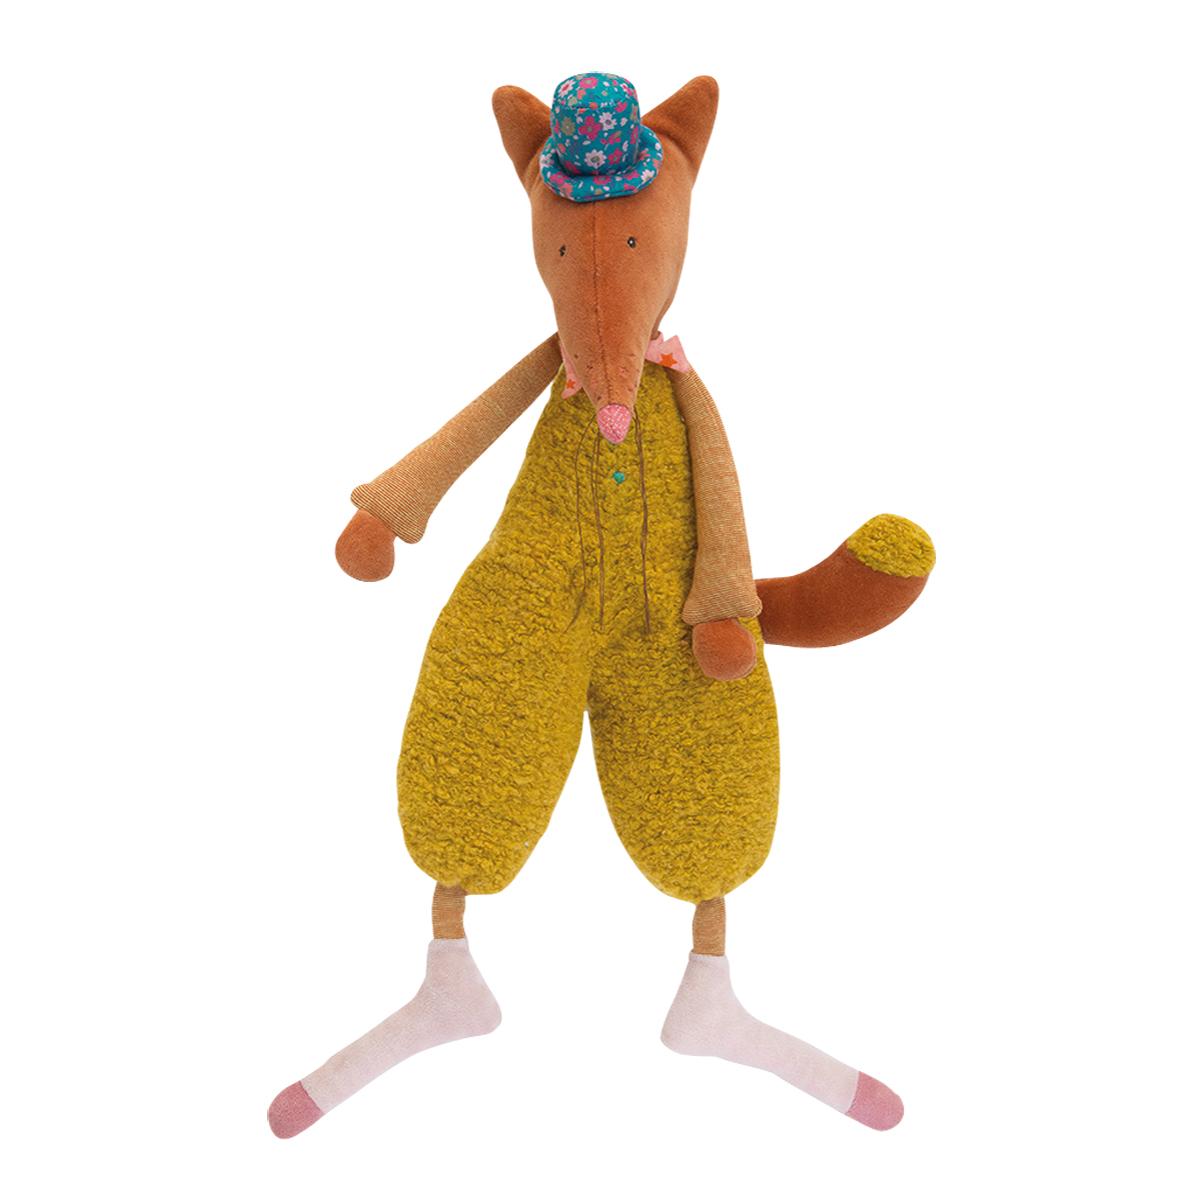 「Les Tartempois」抱き人形・きつねのデデ